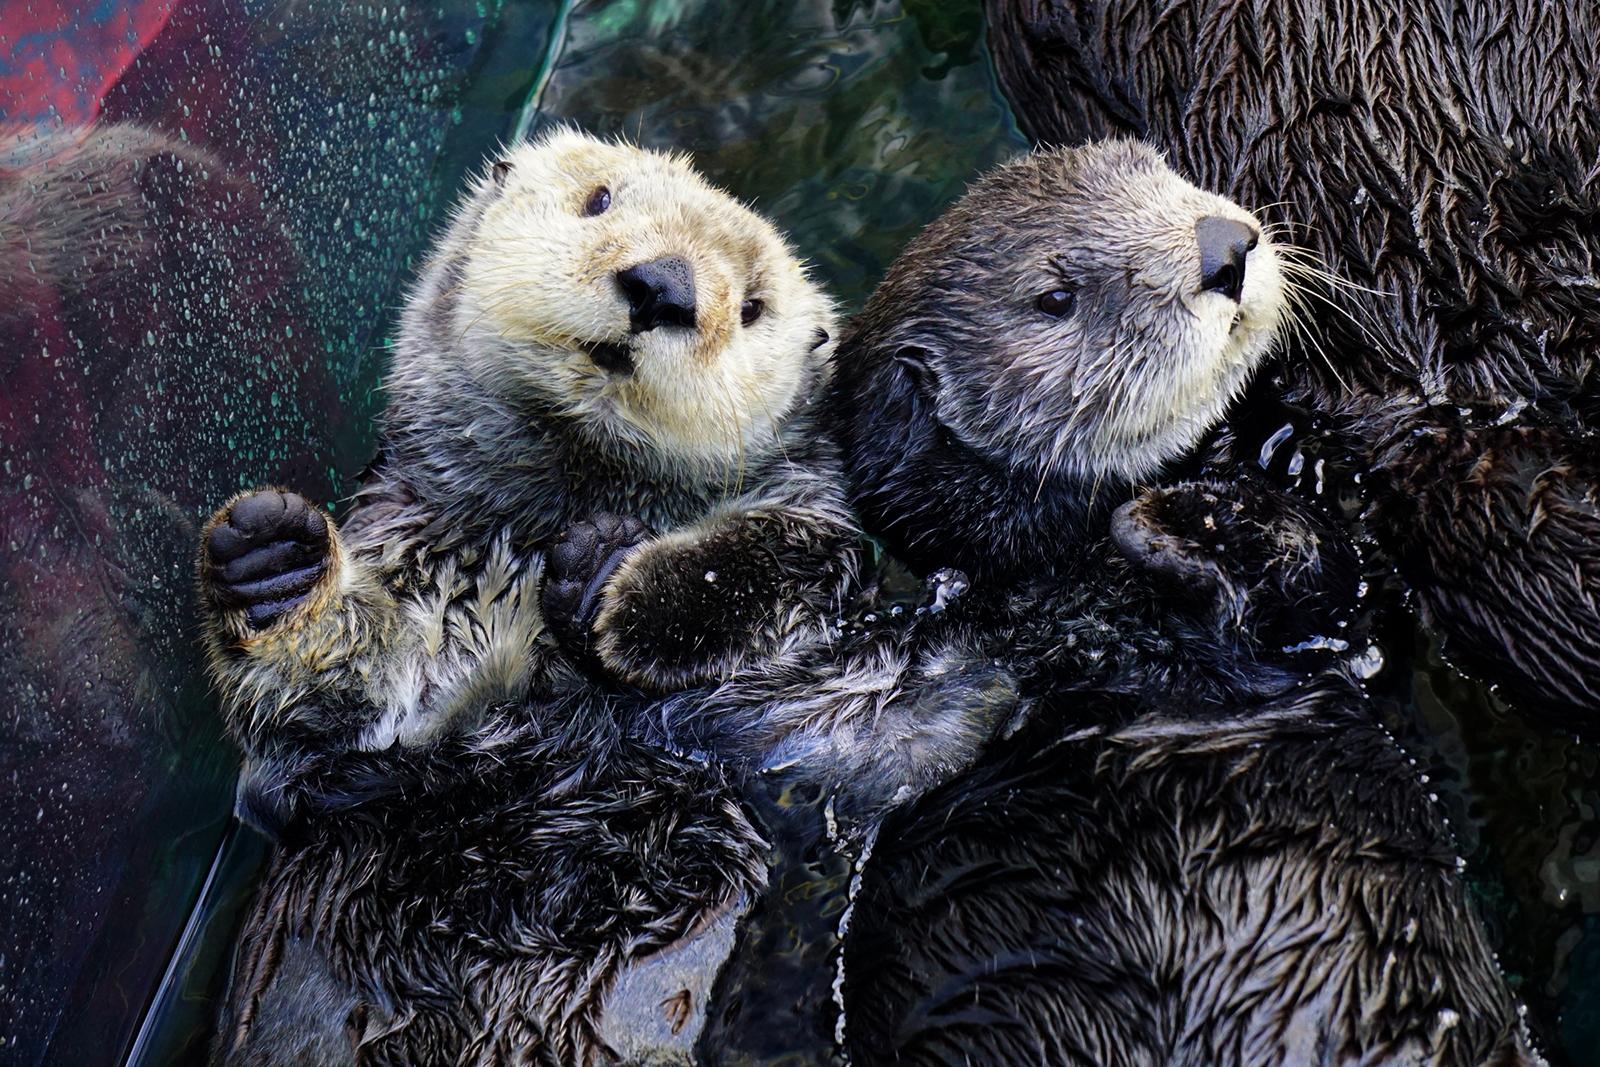 sea-otters-ivy-kit-nd15-007-1600.jpg